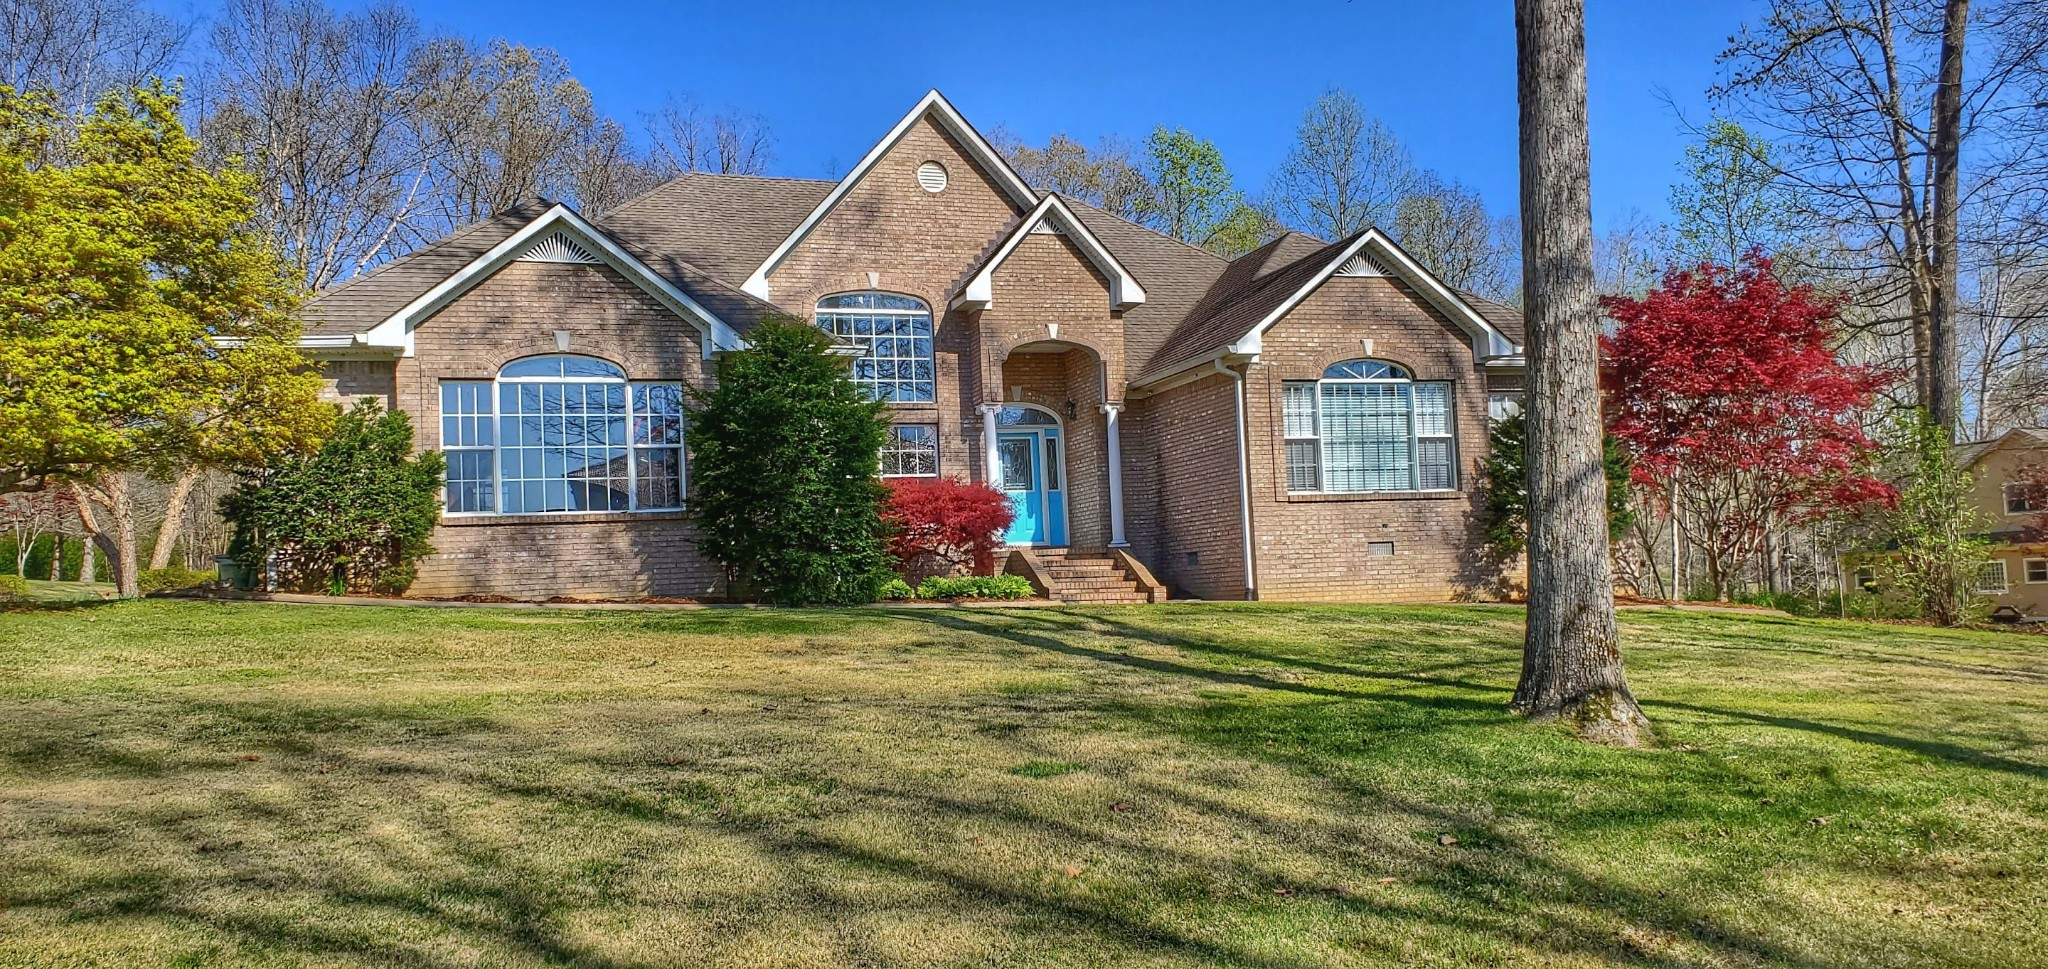 234 Fairway Cir Property Photo - Loretto, TN real estate listing